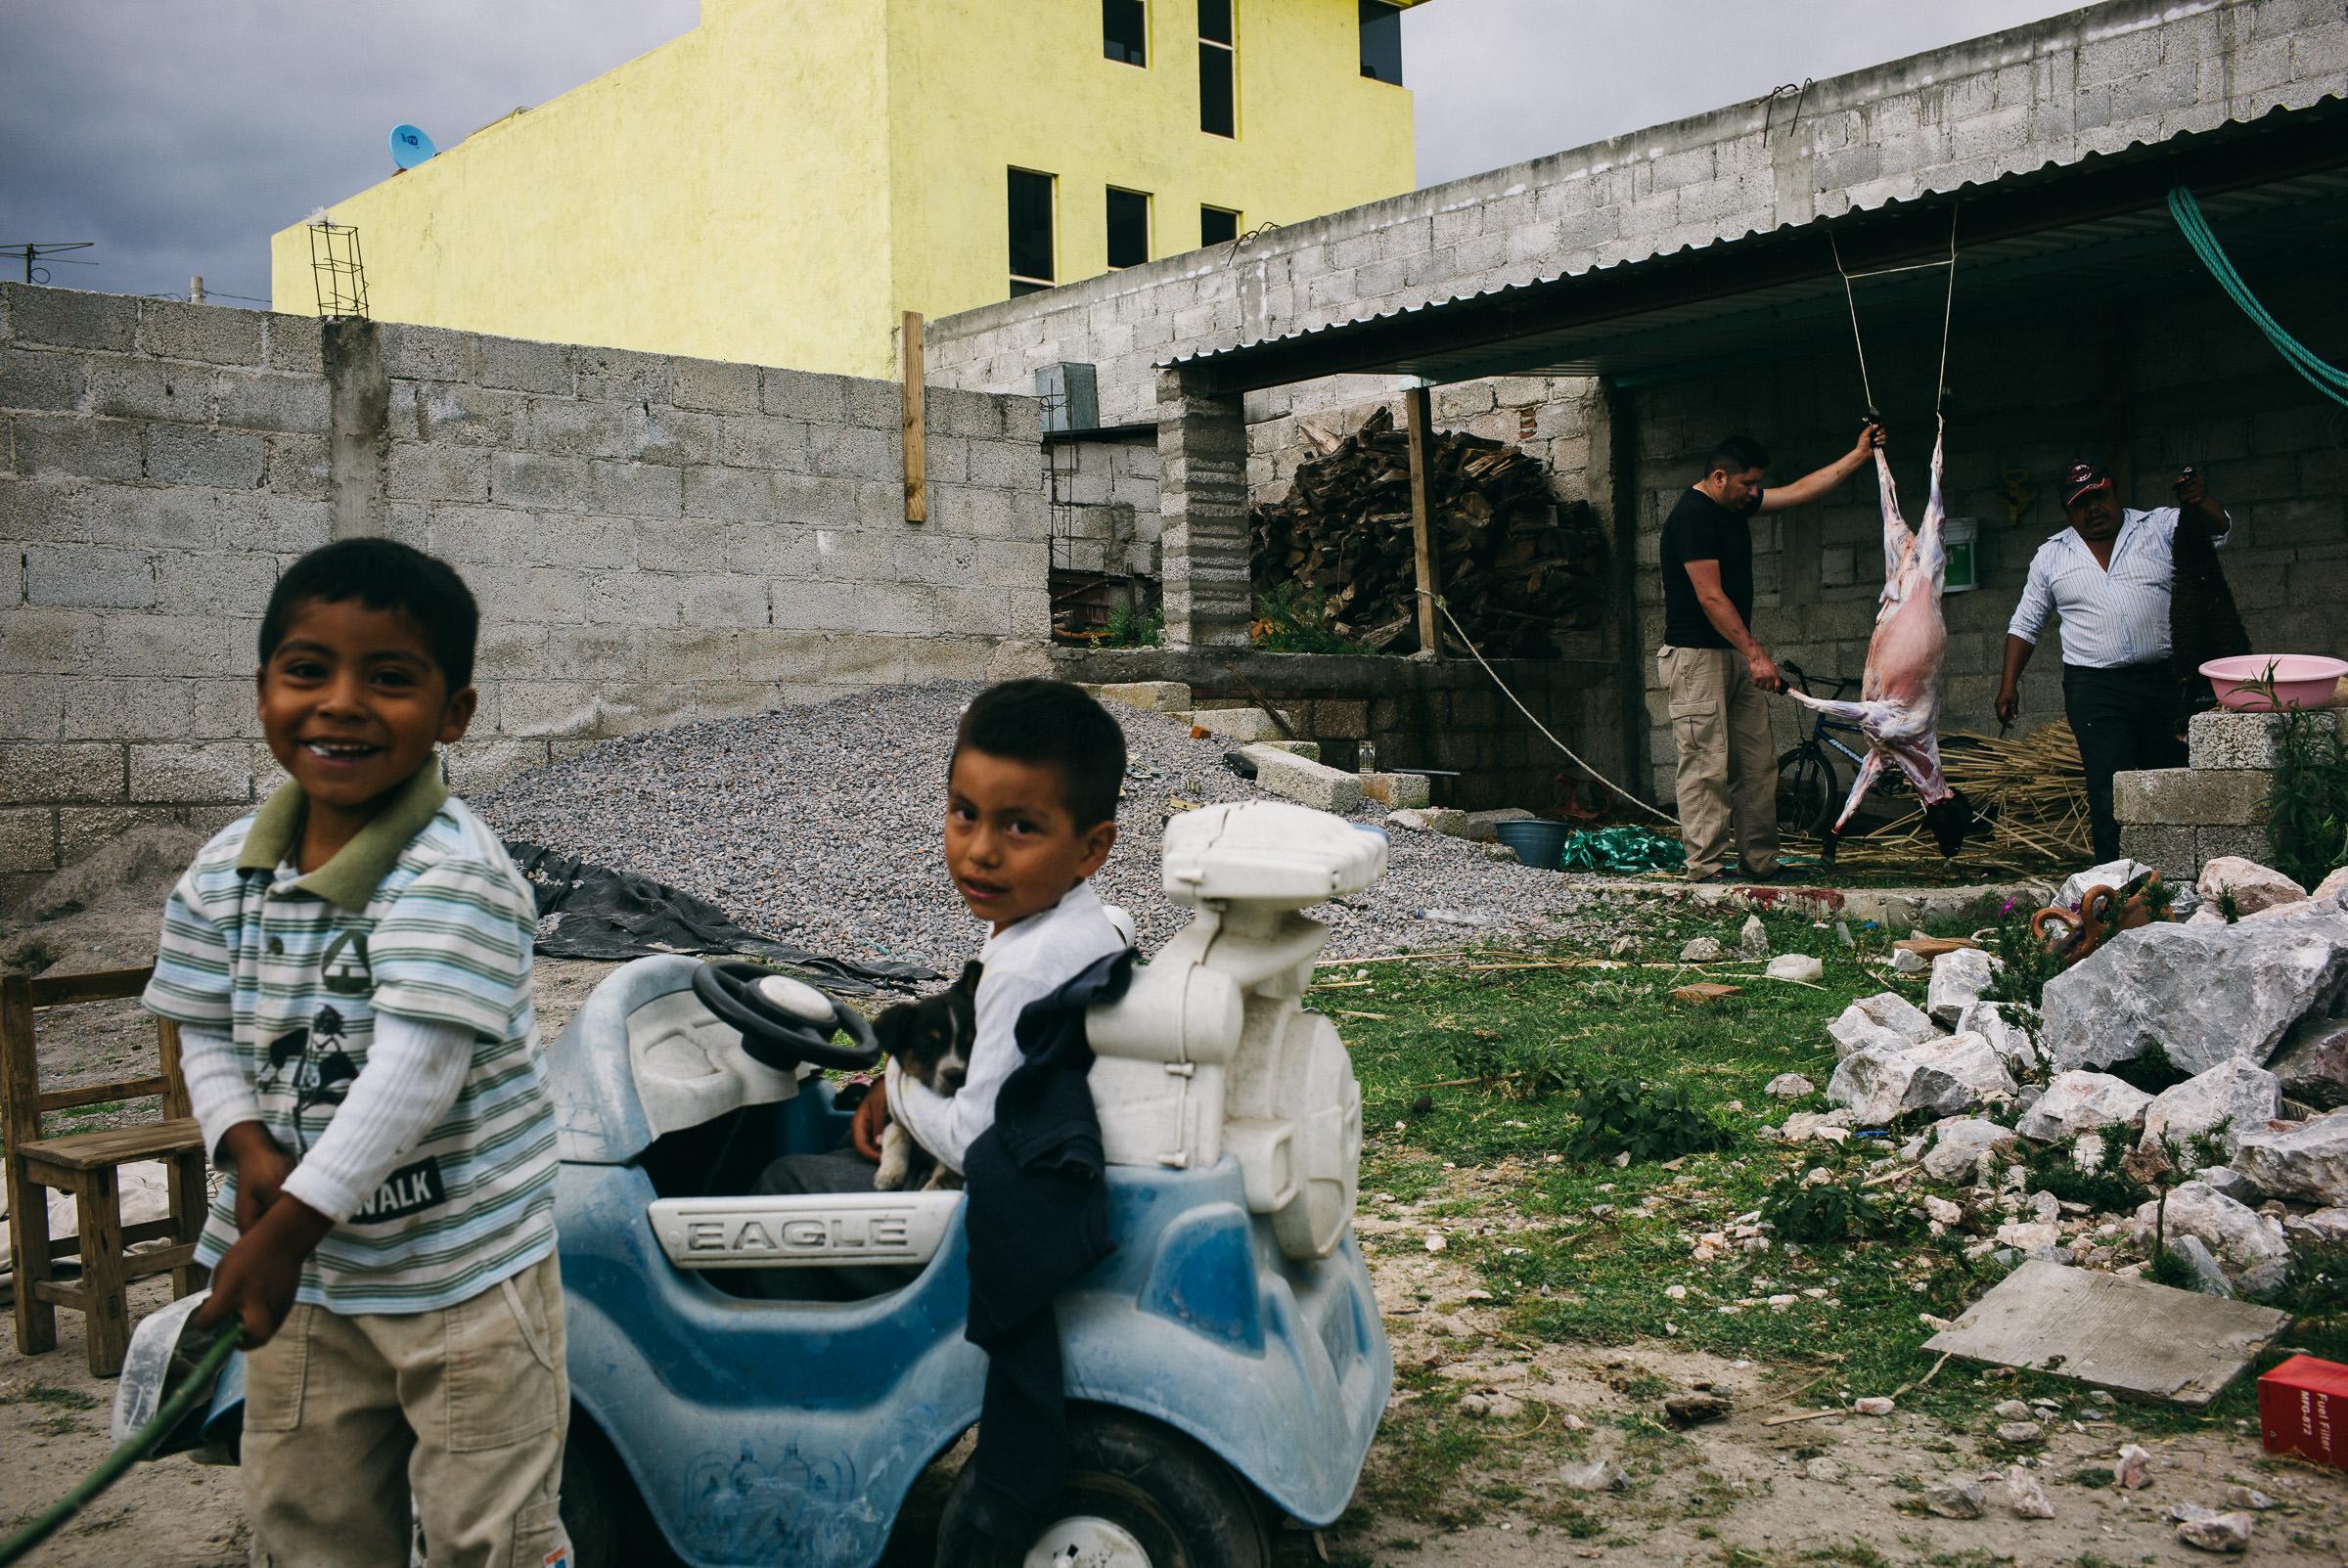 brandon_patoc_travel_photographer_in_mexico_0006.jpg